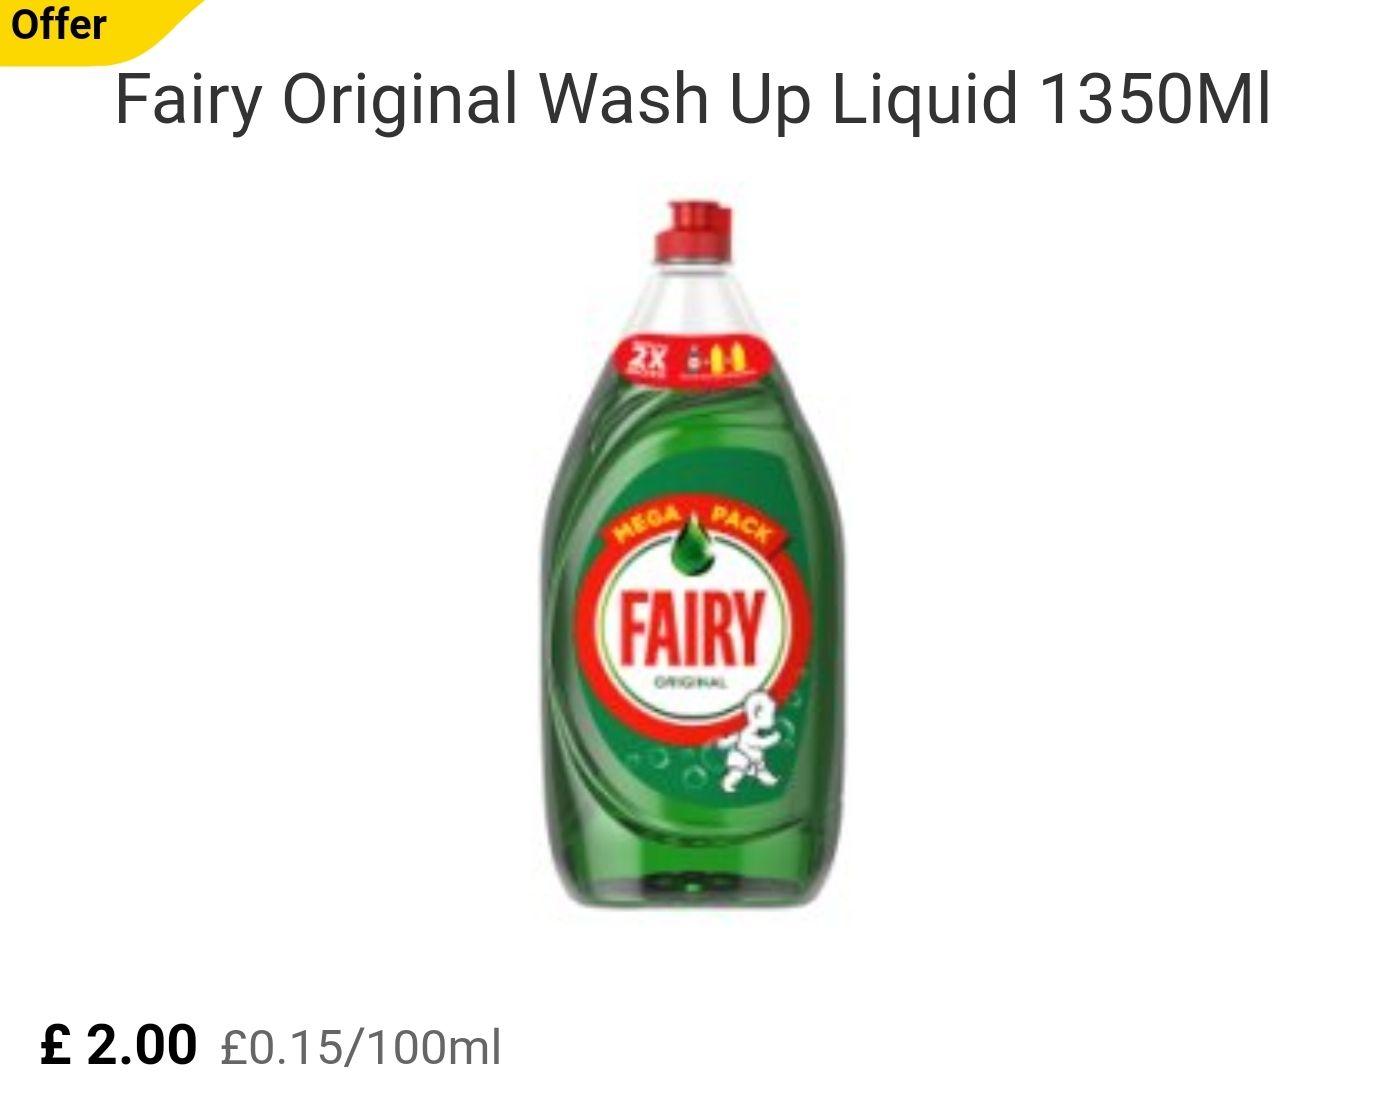 FAIRY ORIGINAL 1350ml £2.00 TESCO